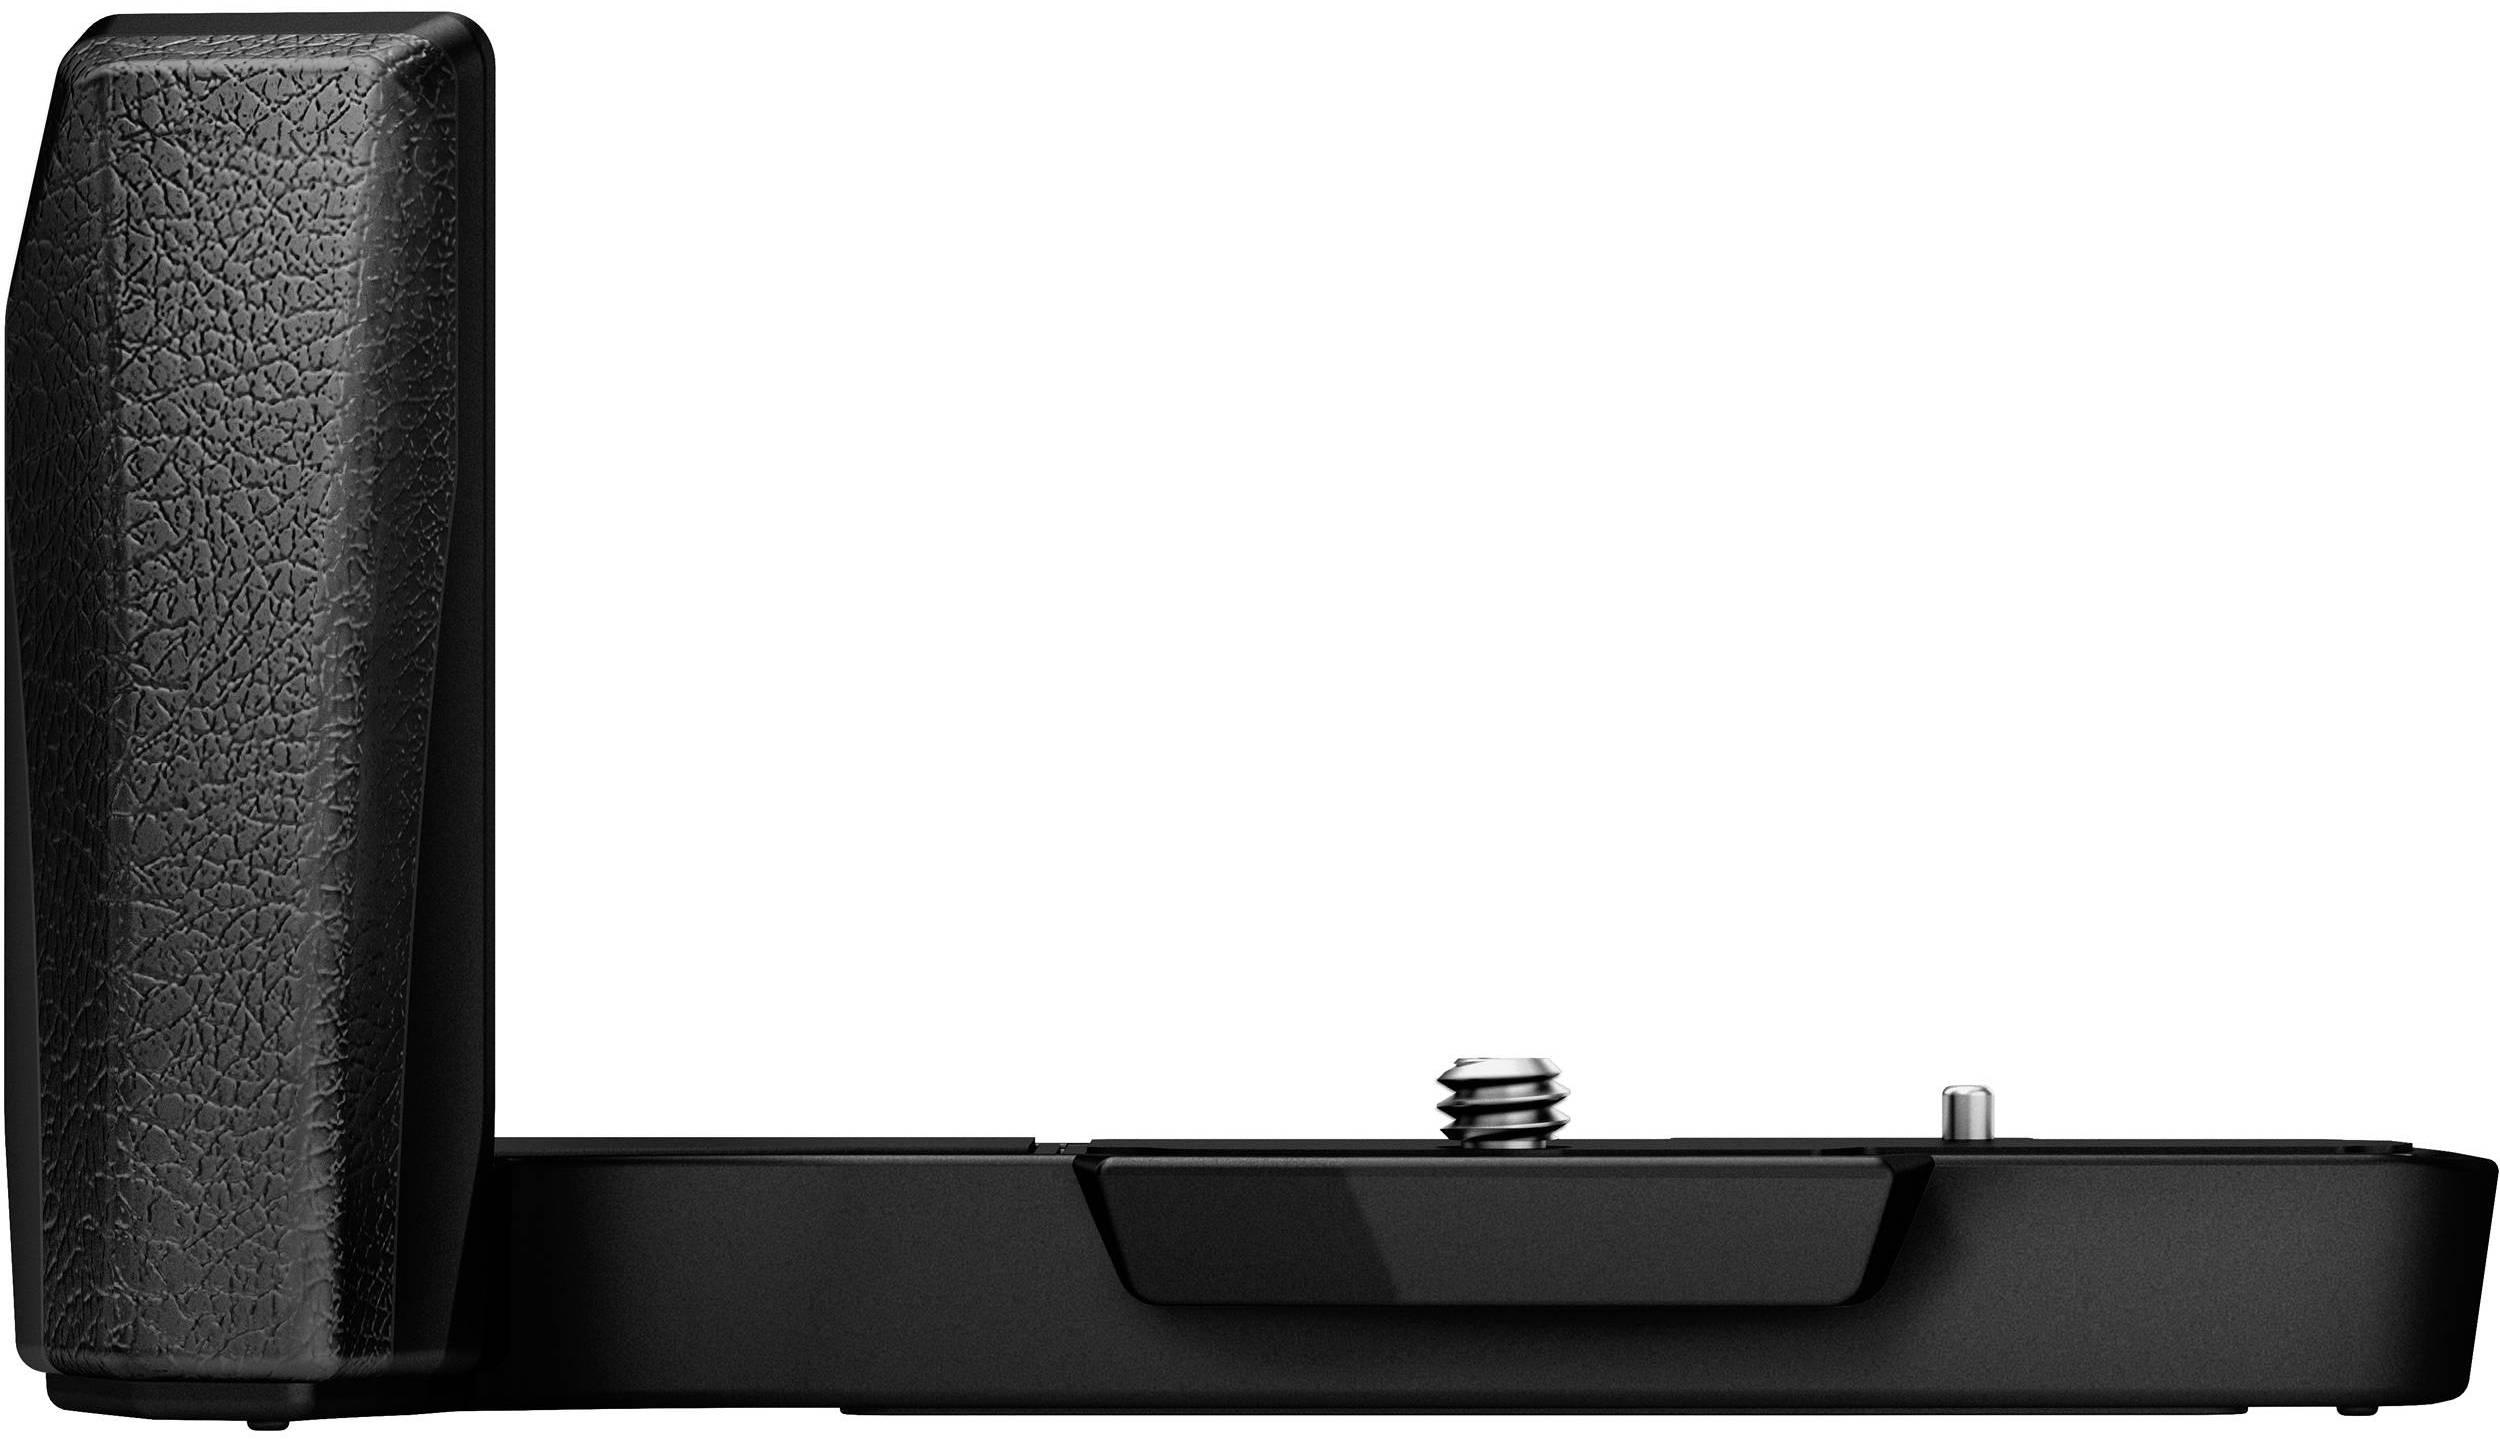 OLYMPUS ECG-2 Přídavný grip pro E-M5 Mark II Arca-Swiss